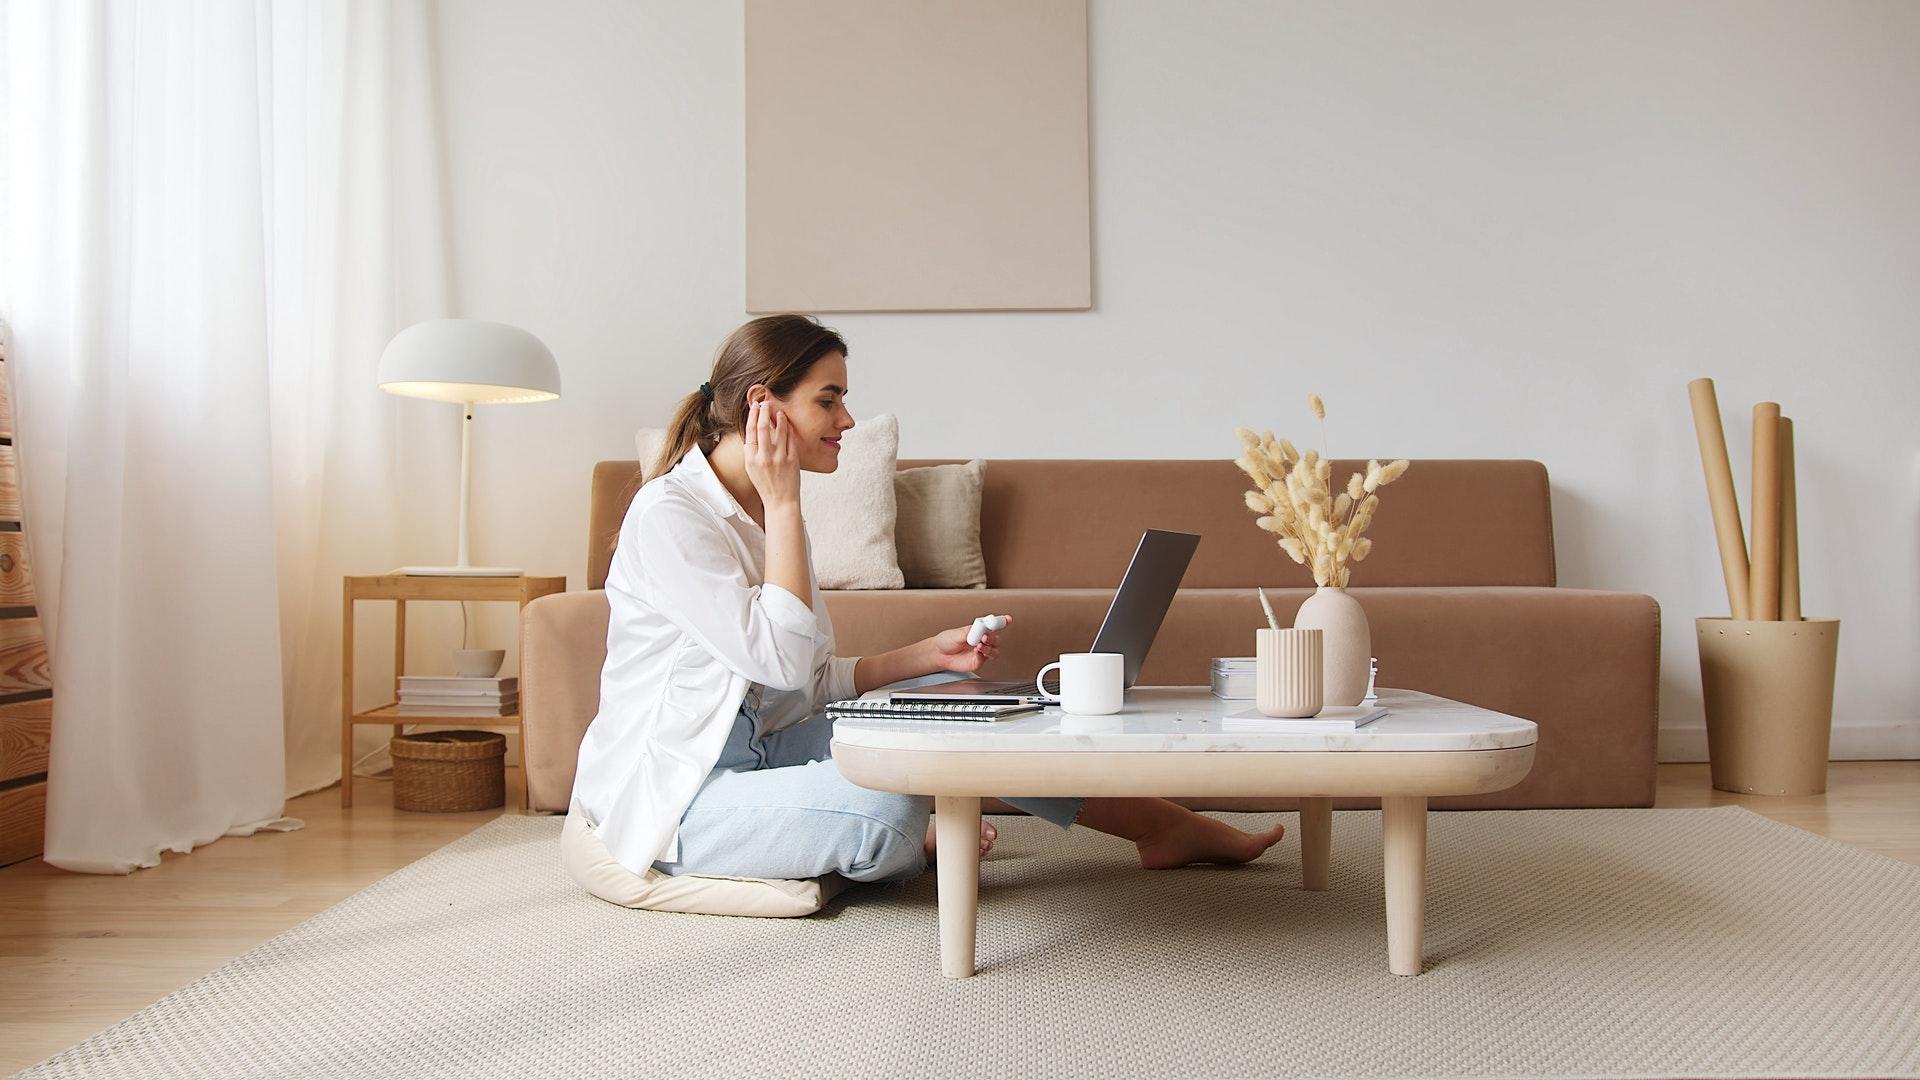 (P) Beneficiile psihoterapiei online in vremea pandemiei